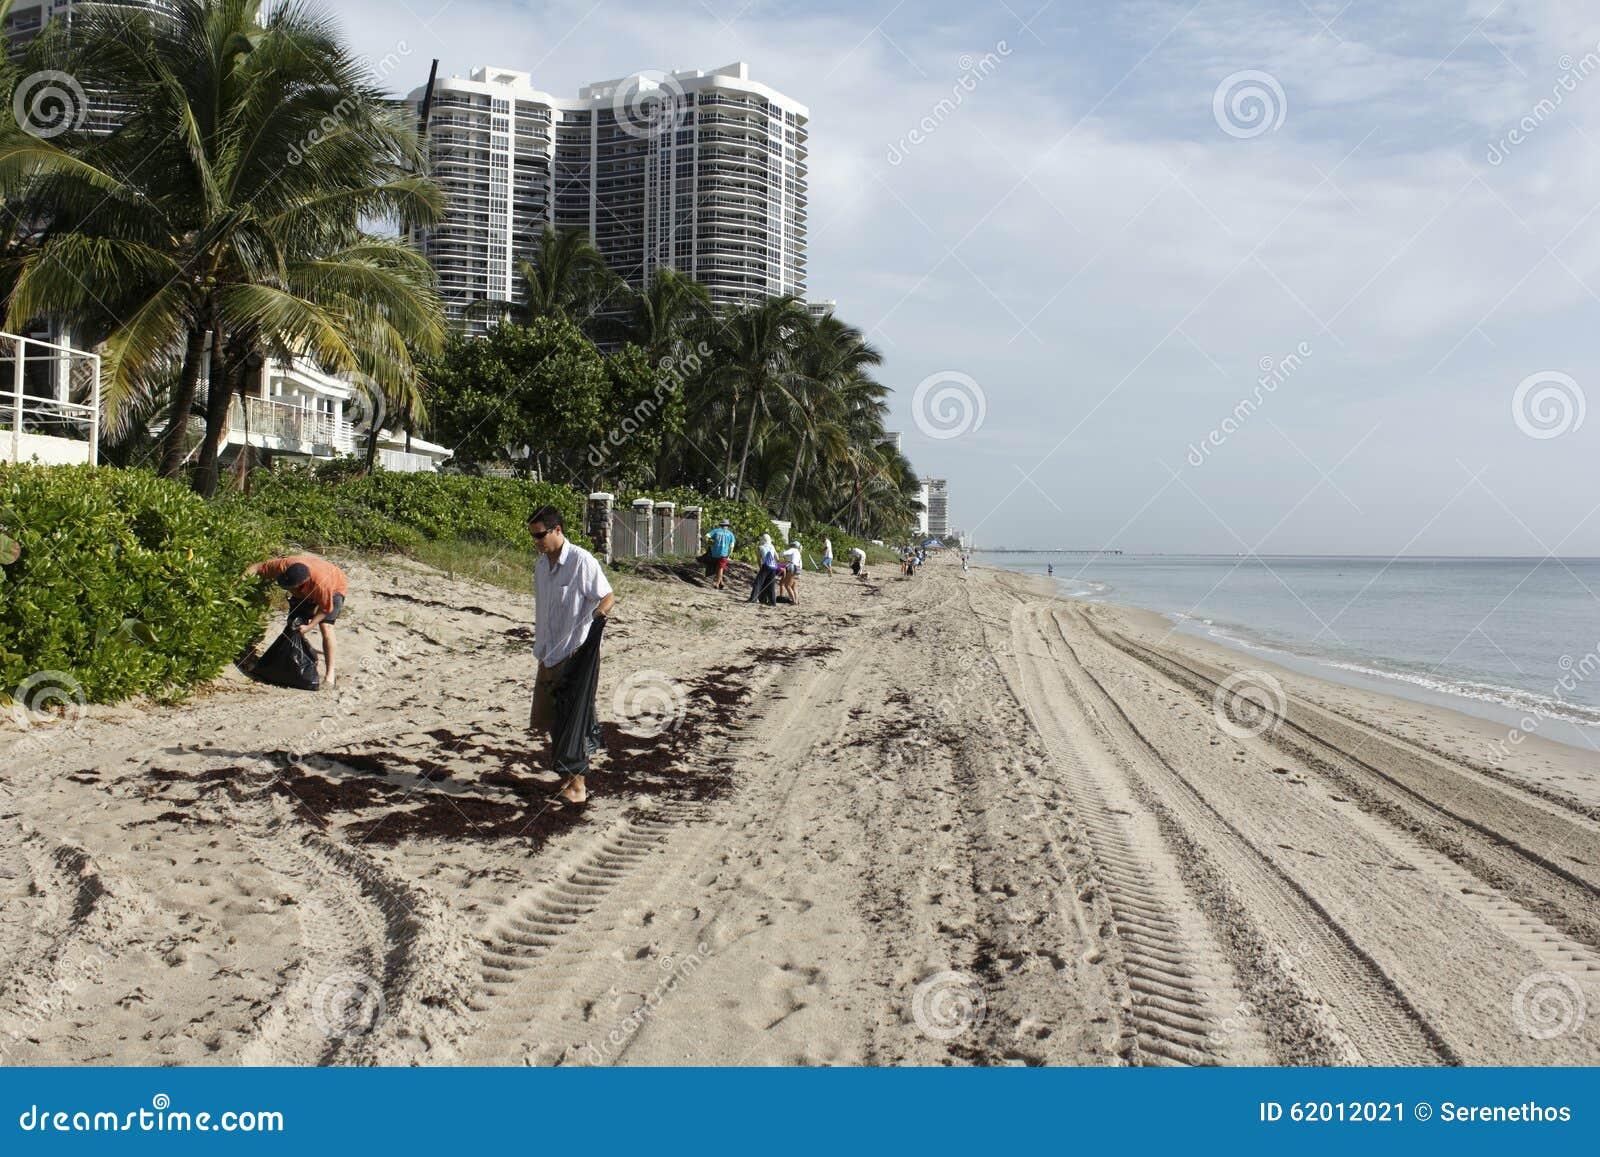 Volunteer In Atlantic Beach Fl